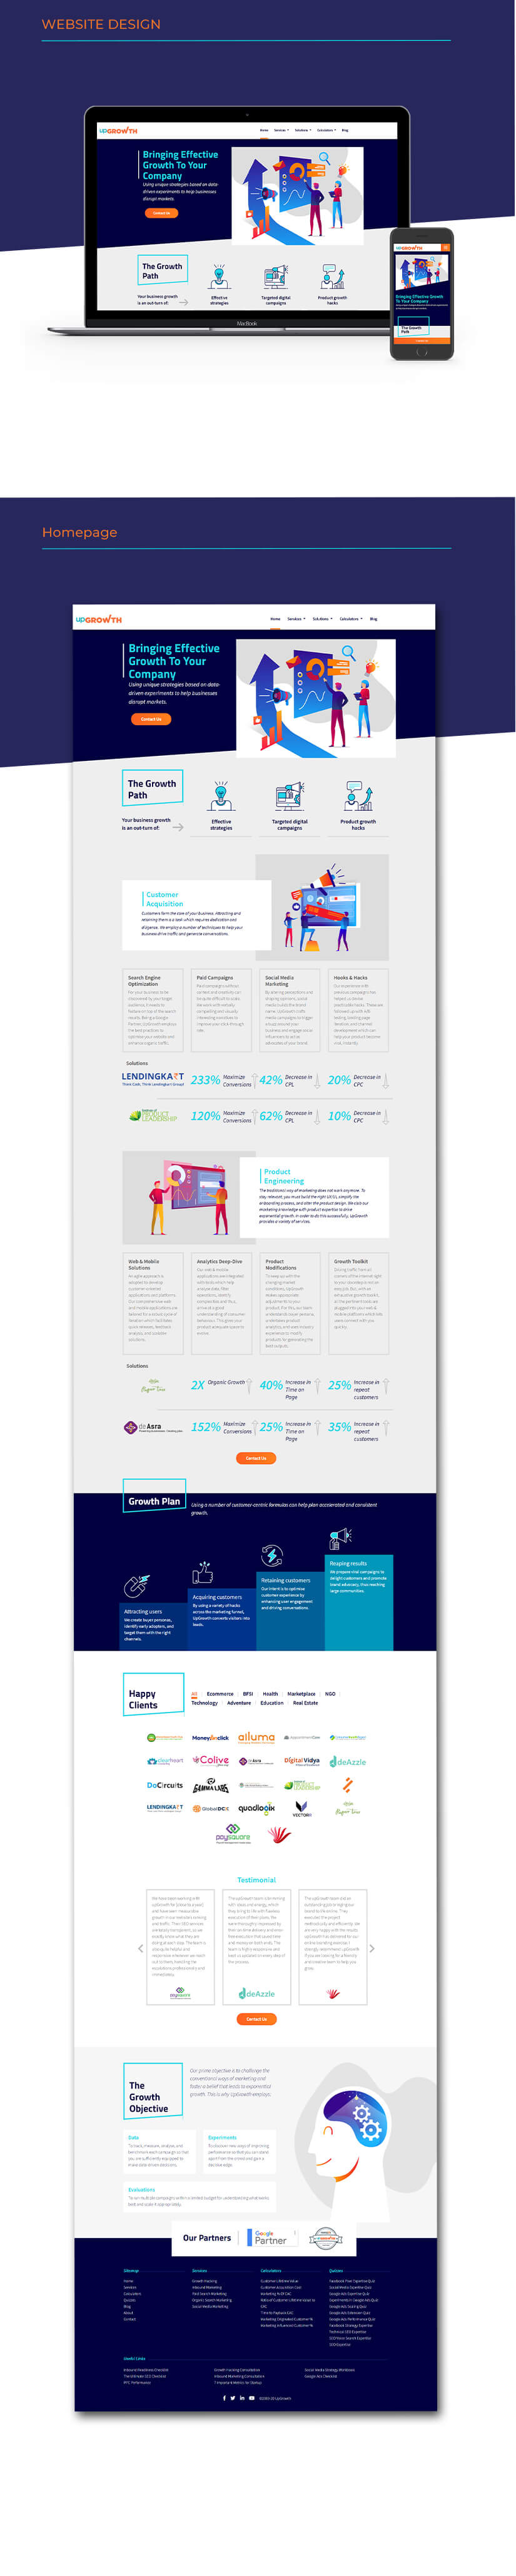 UpGrowth website homepage design